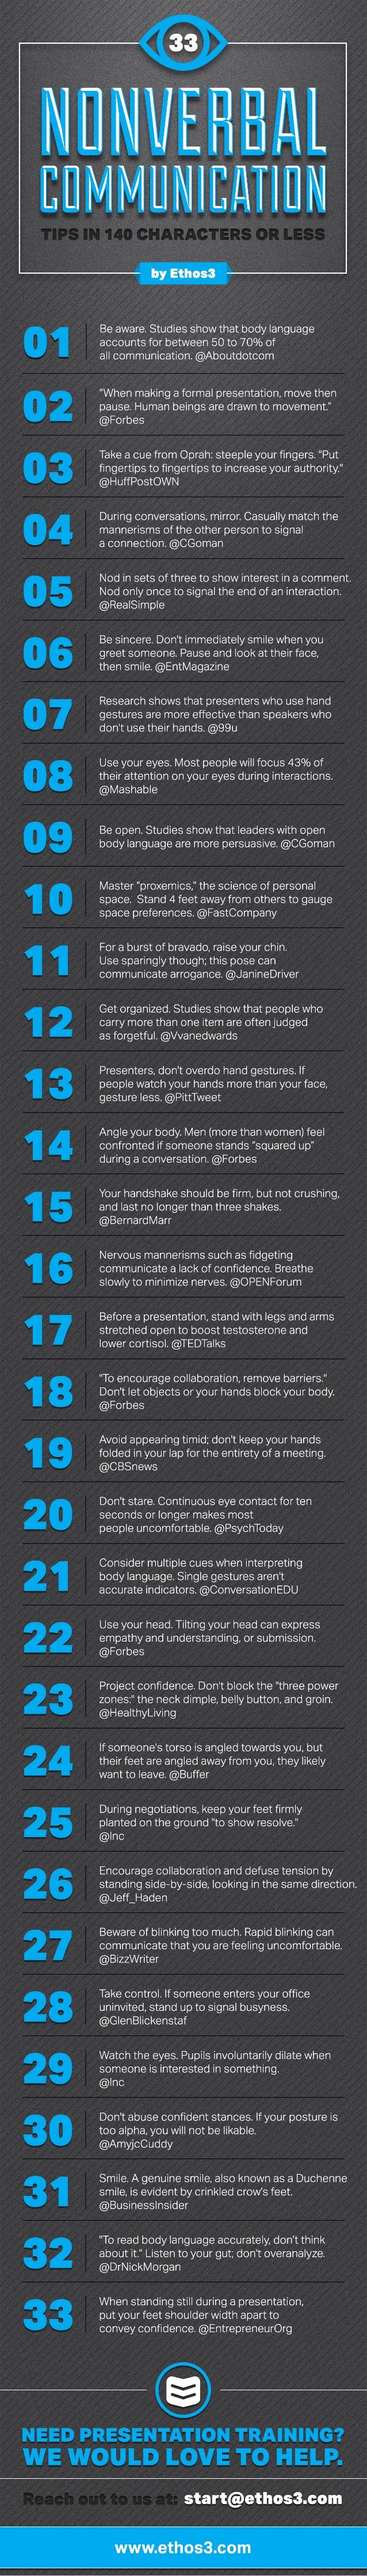 33-nonverbal-communication-tips.jpg